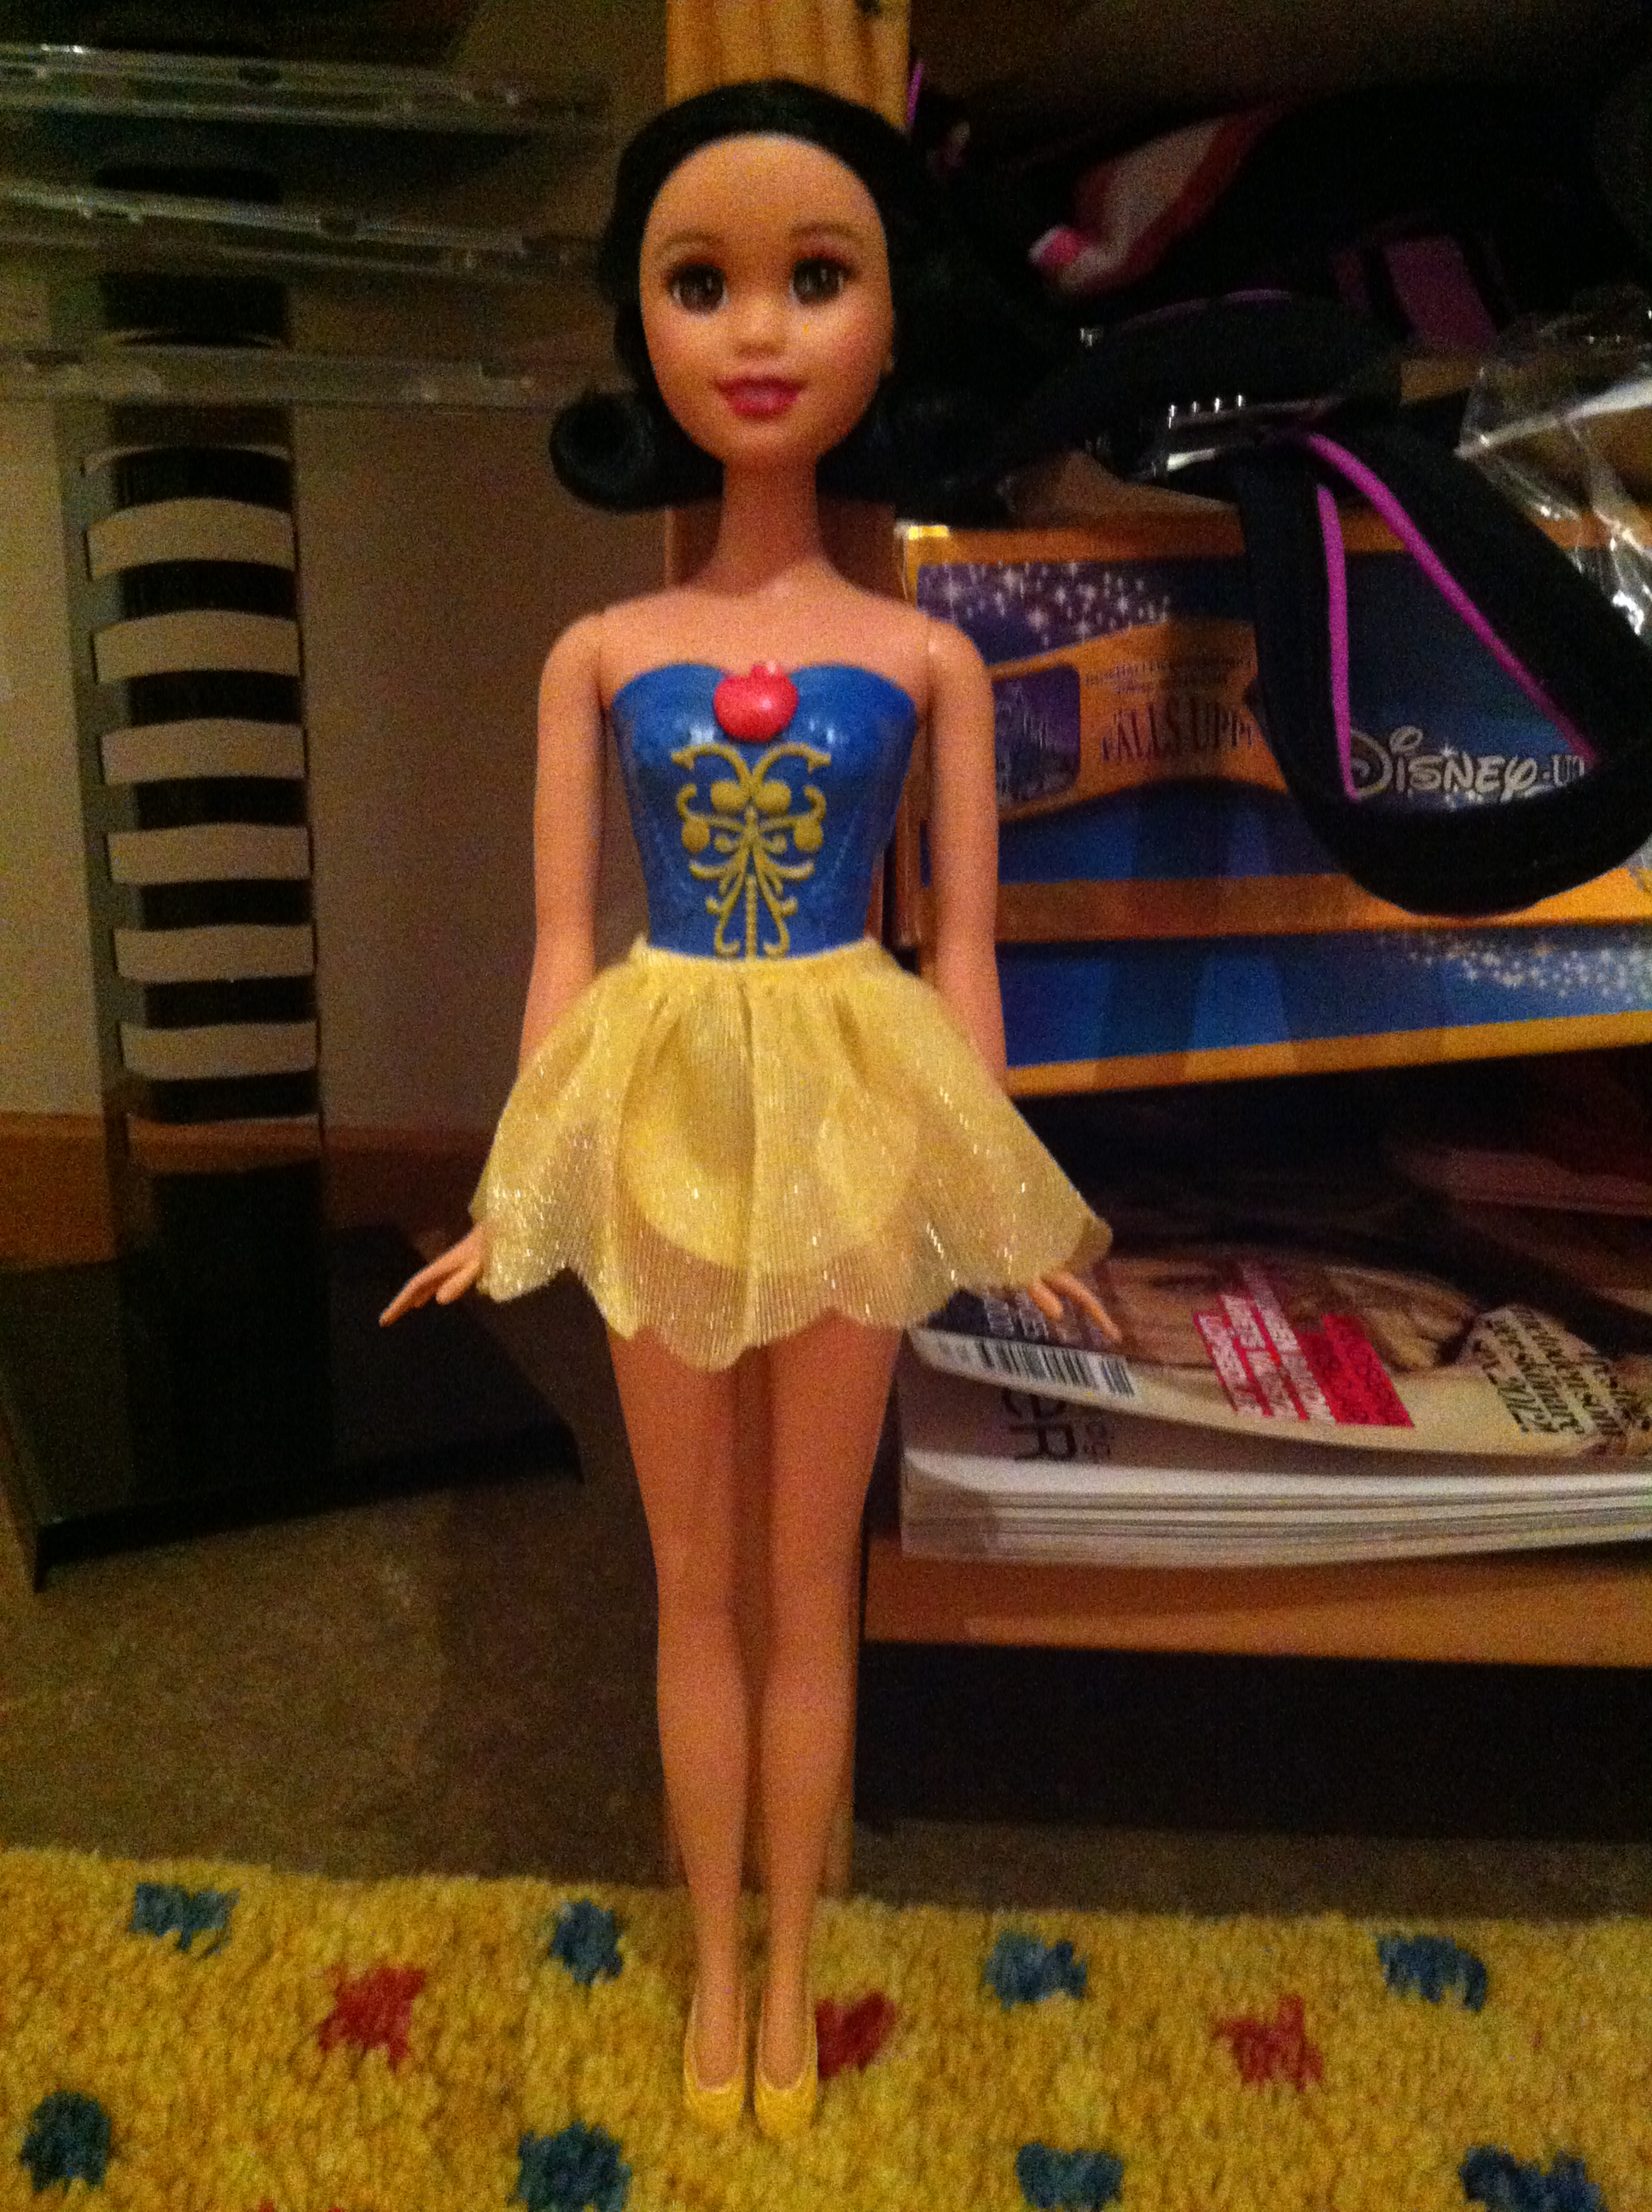 My new Snow White Doll